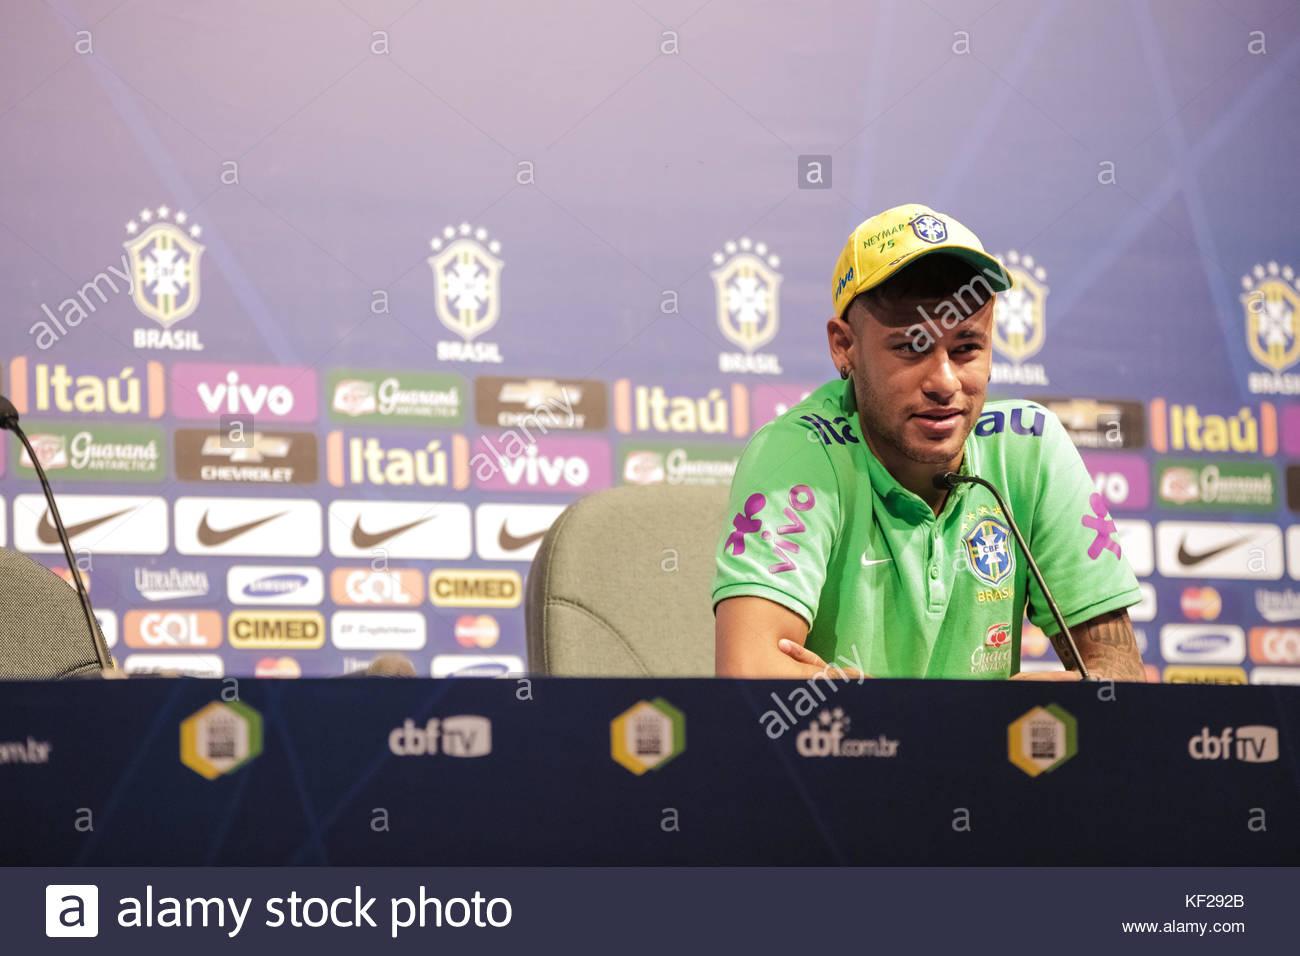 Brazil Press Conference - PERNAMBUCO, BRAZIL - MARCH 24: Neymar Jr of Brazil looks on during a press conference - Stock Image